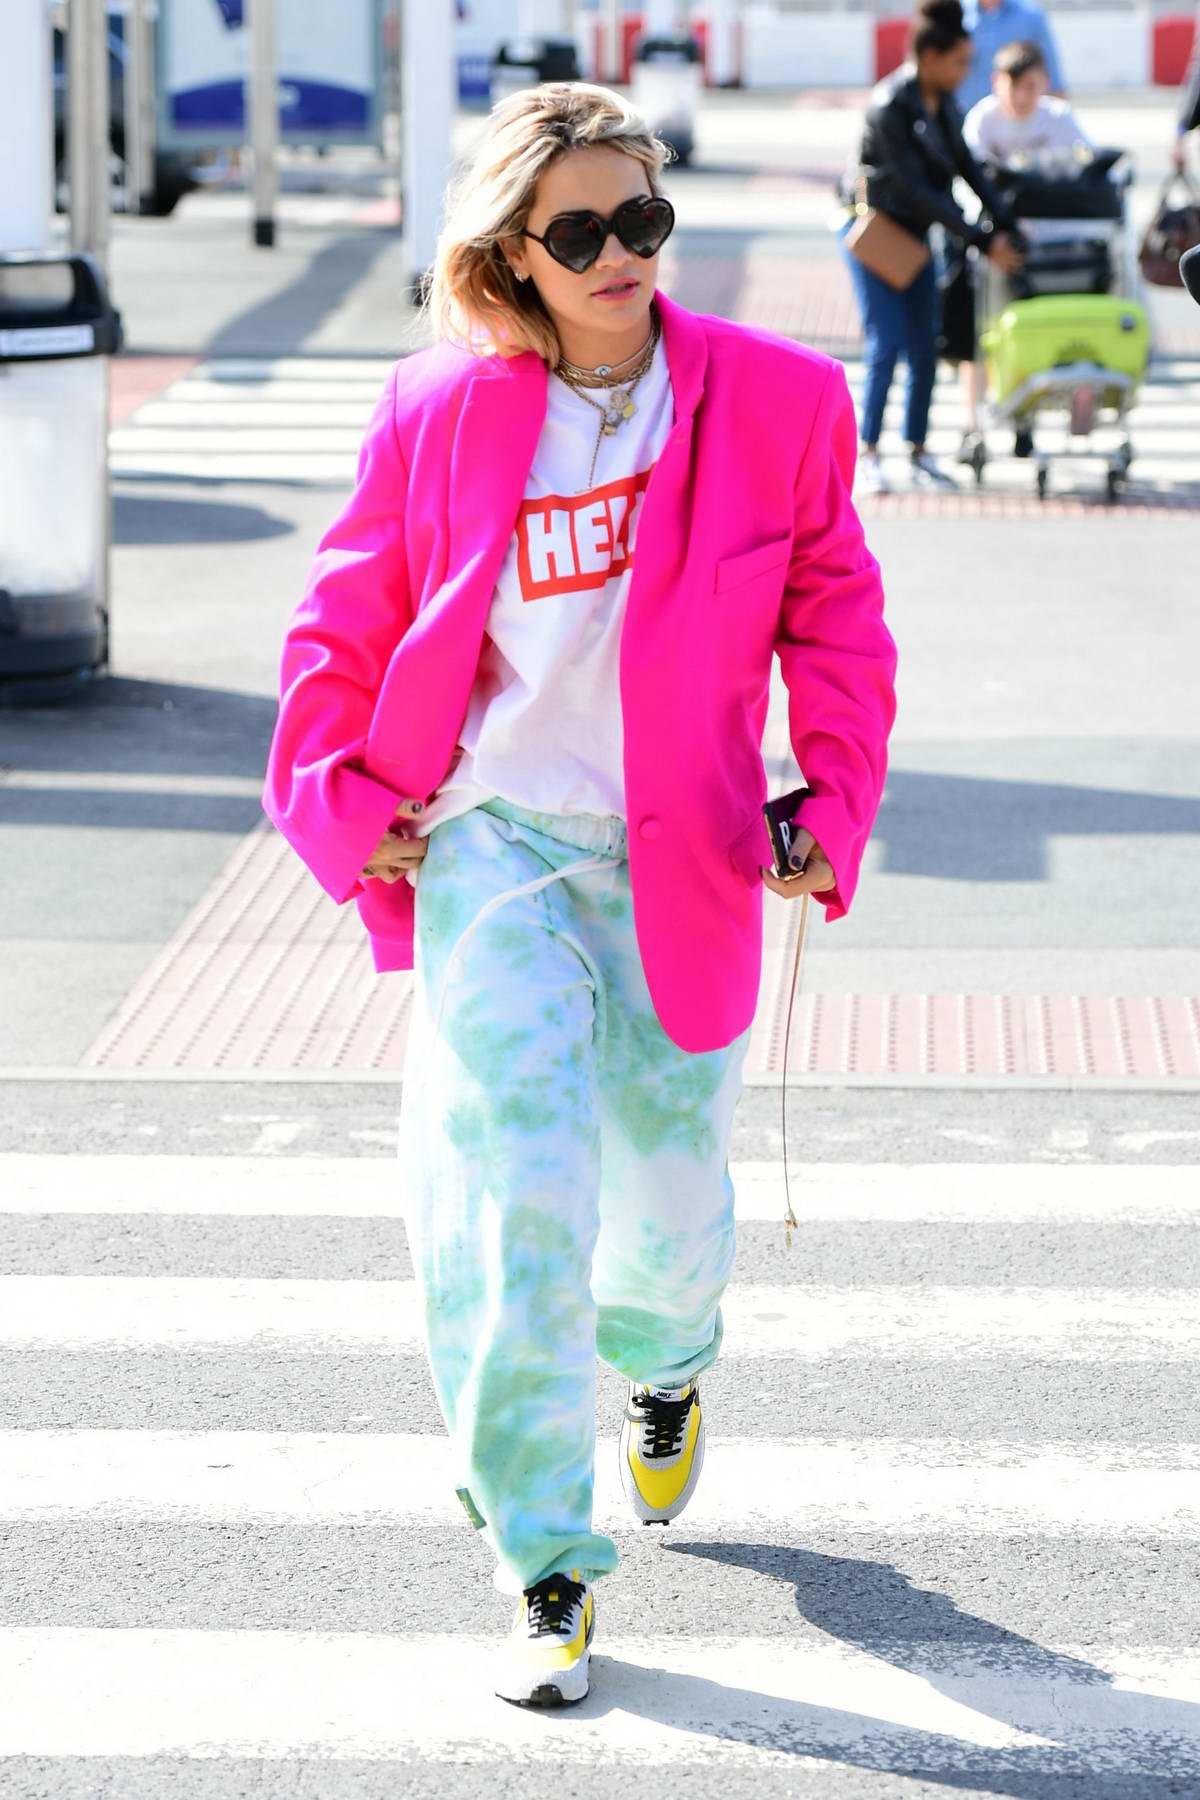 Rita Ora rocks a fuchsia blazer and colorful tie-dye sweatpants as she heads to Heathrow airport in London, UK